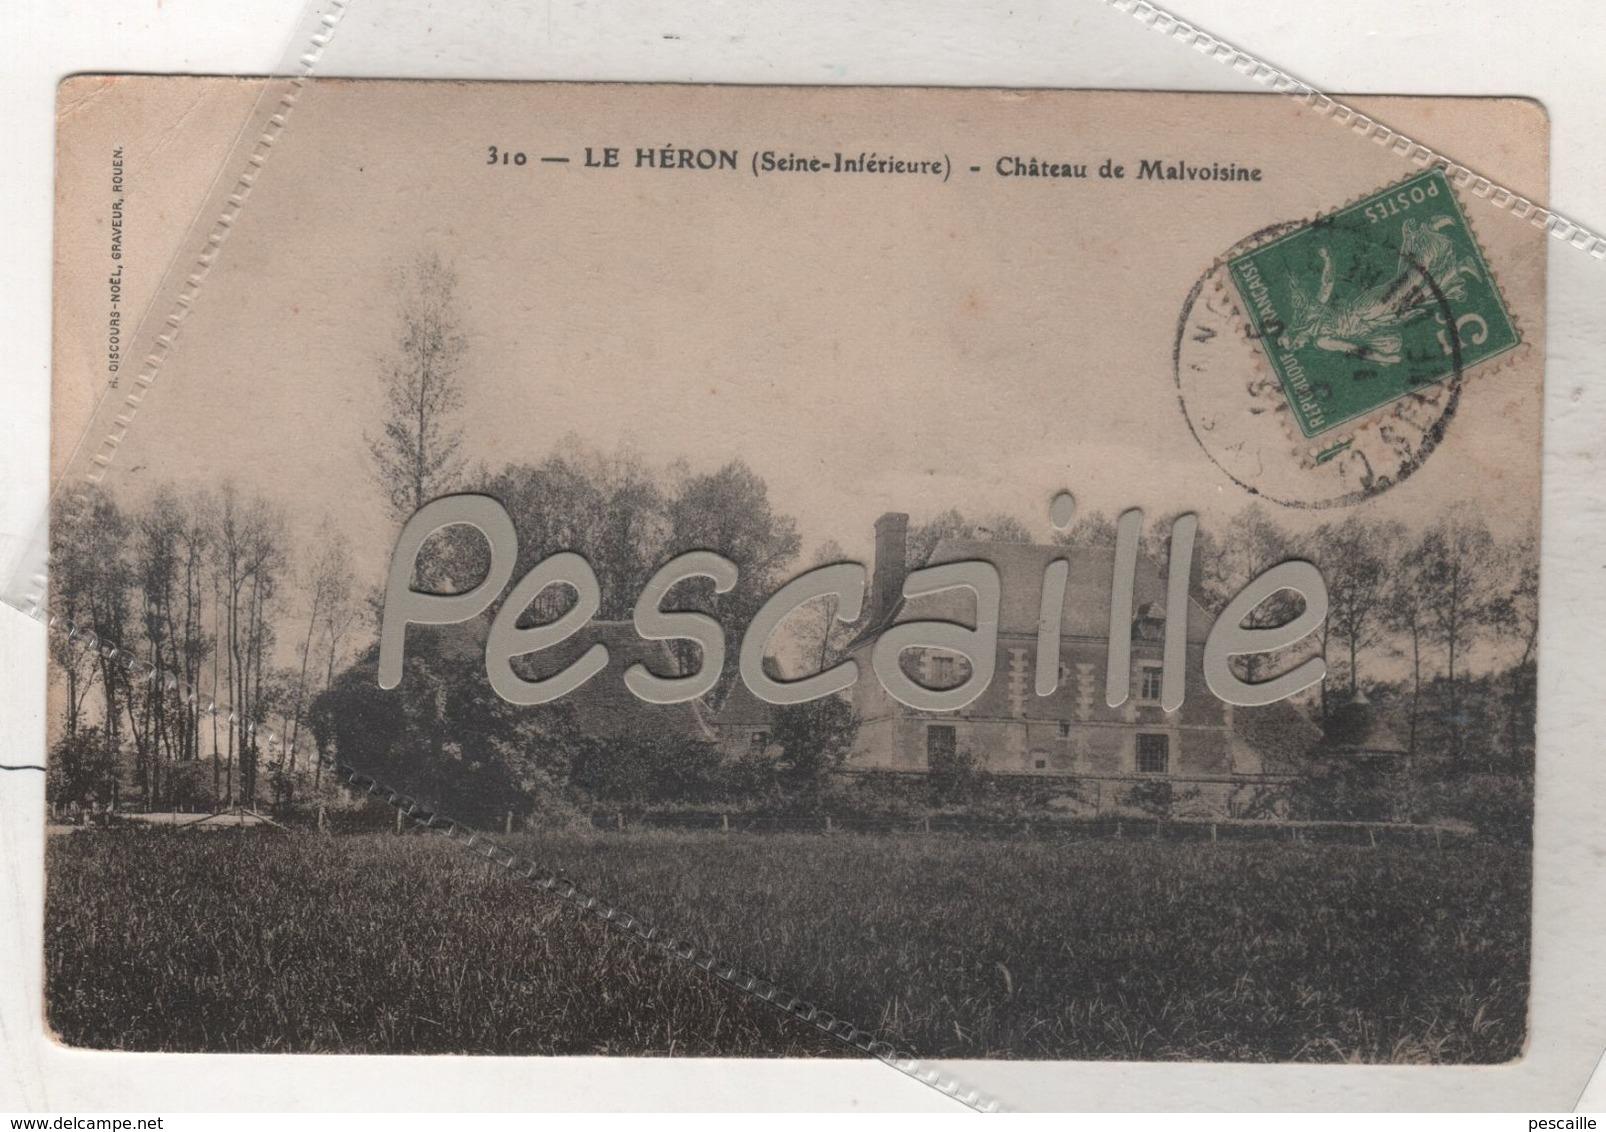 76 SEINE MARITIME - CP LE HERON - CHATEAU DE MALVOISINE - EDITION ??? N° 310 - CIRCULEE EN 1914 ? - Other Municipalities